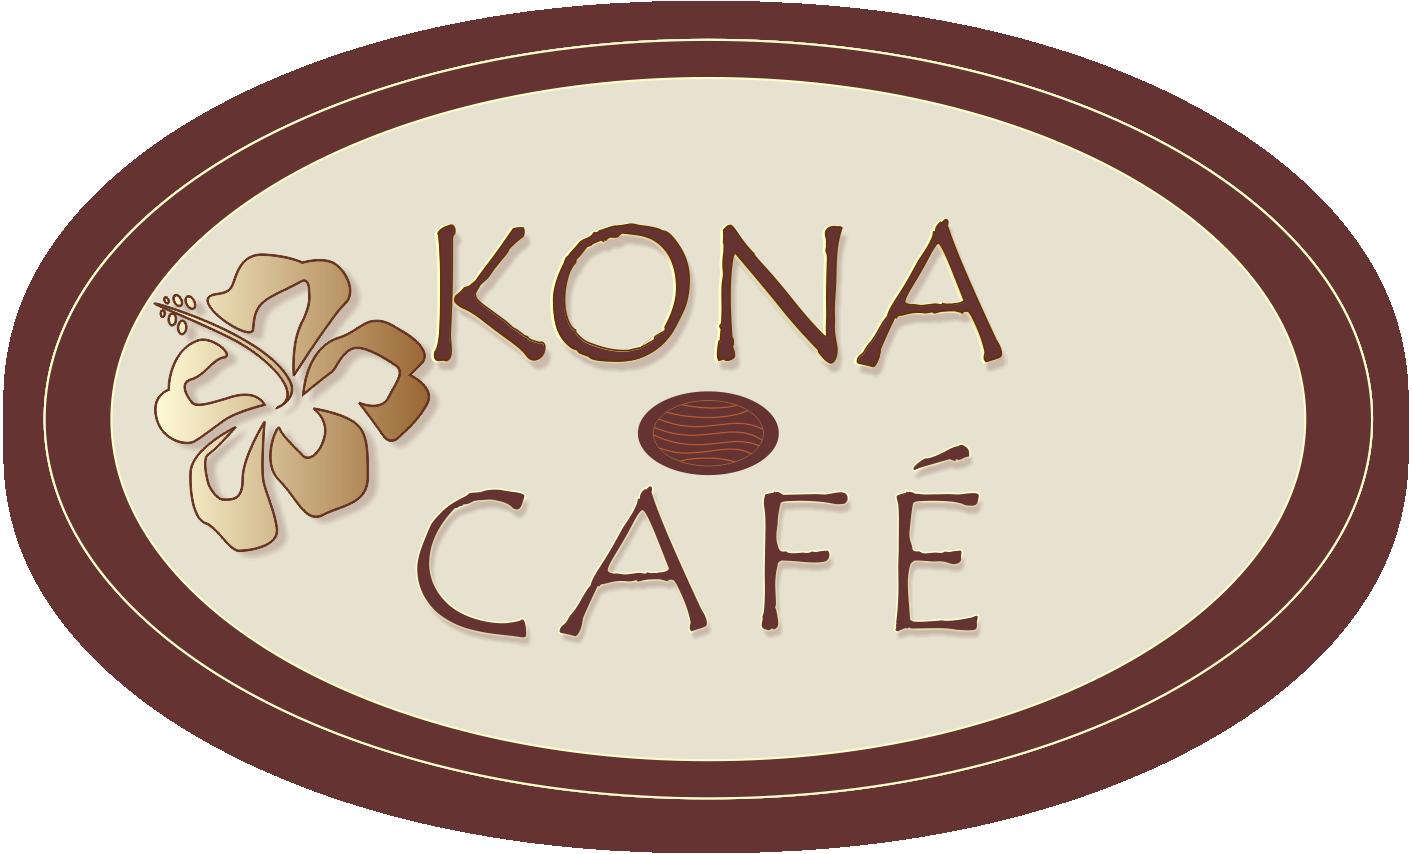 KONA Cafe logo